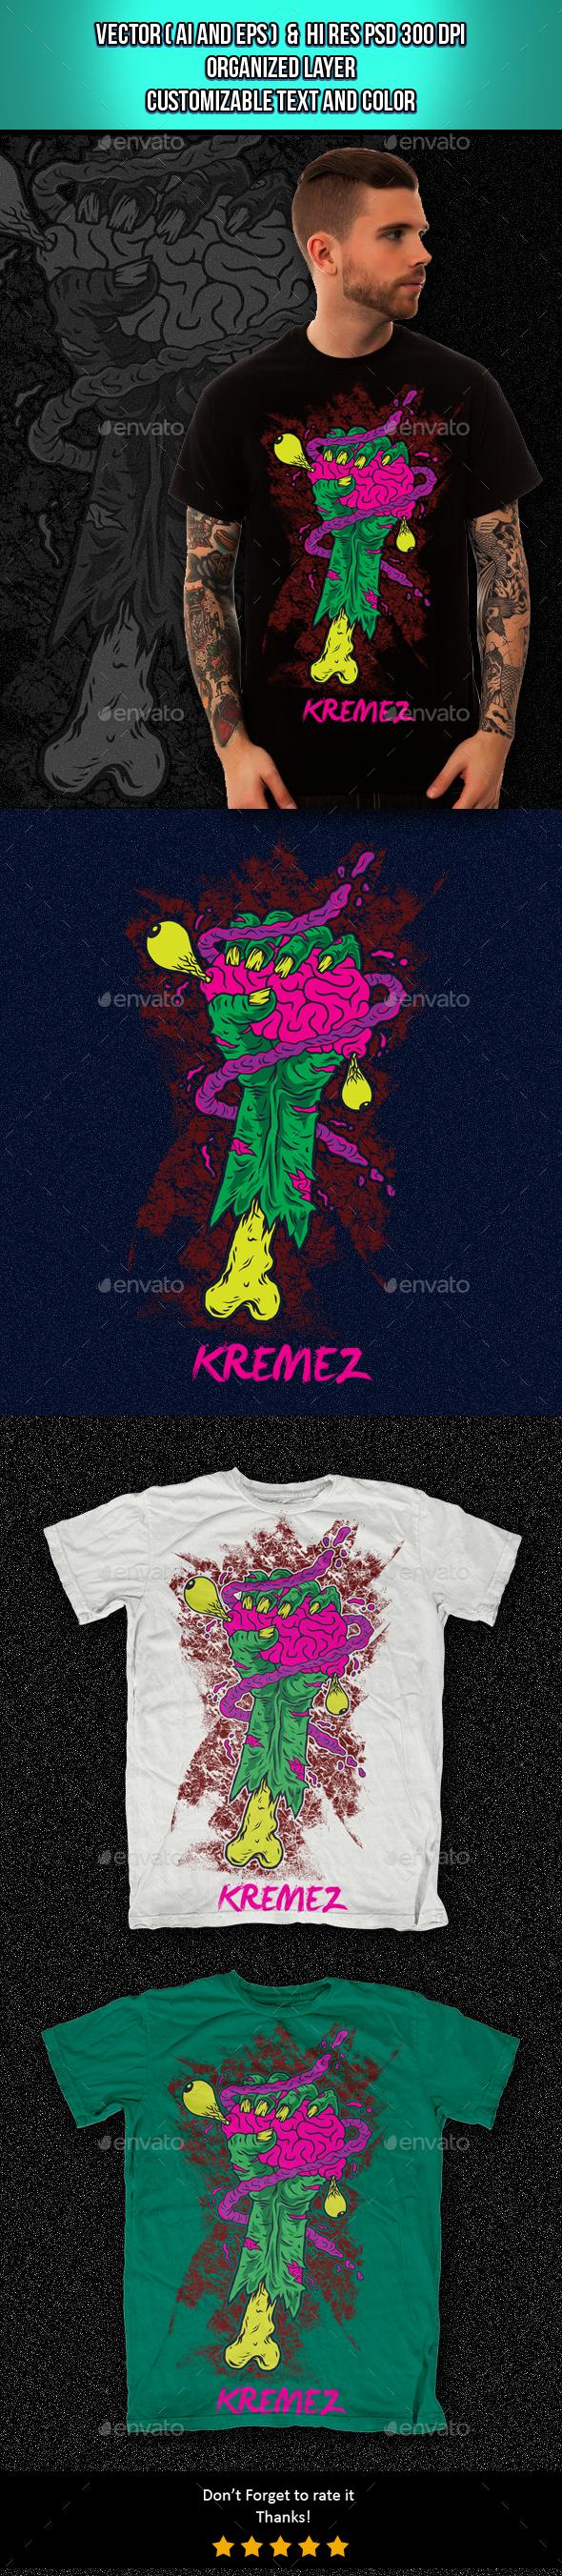 Kremes - Grunge Designs